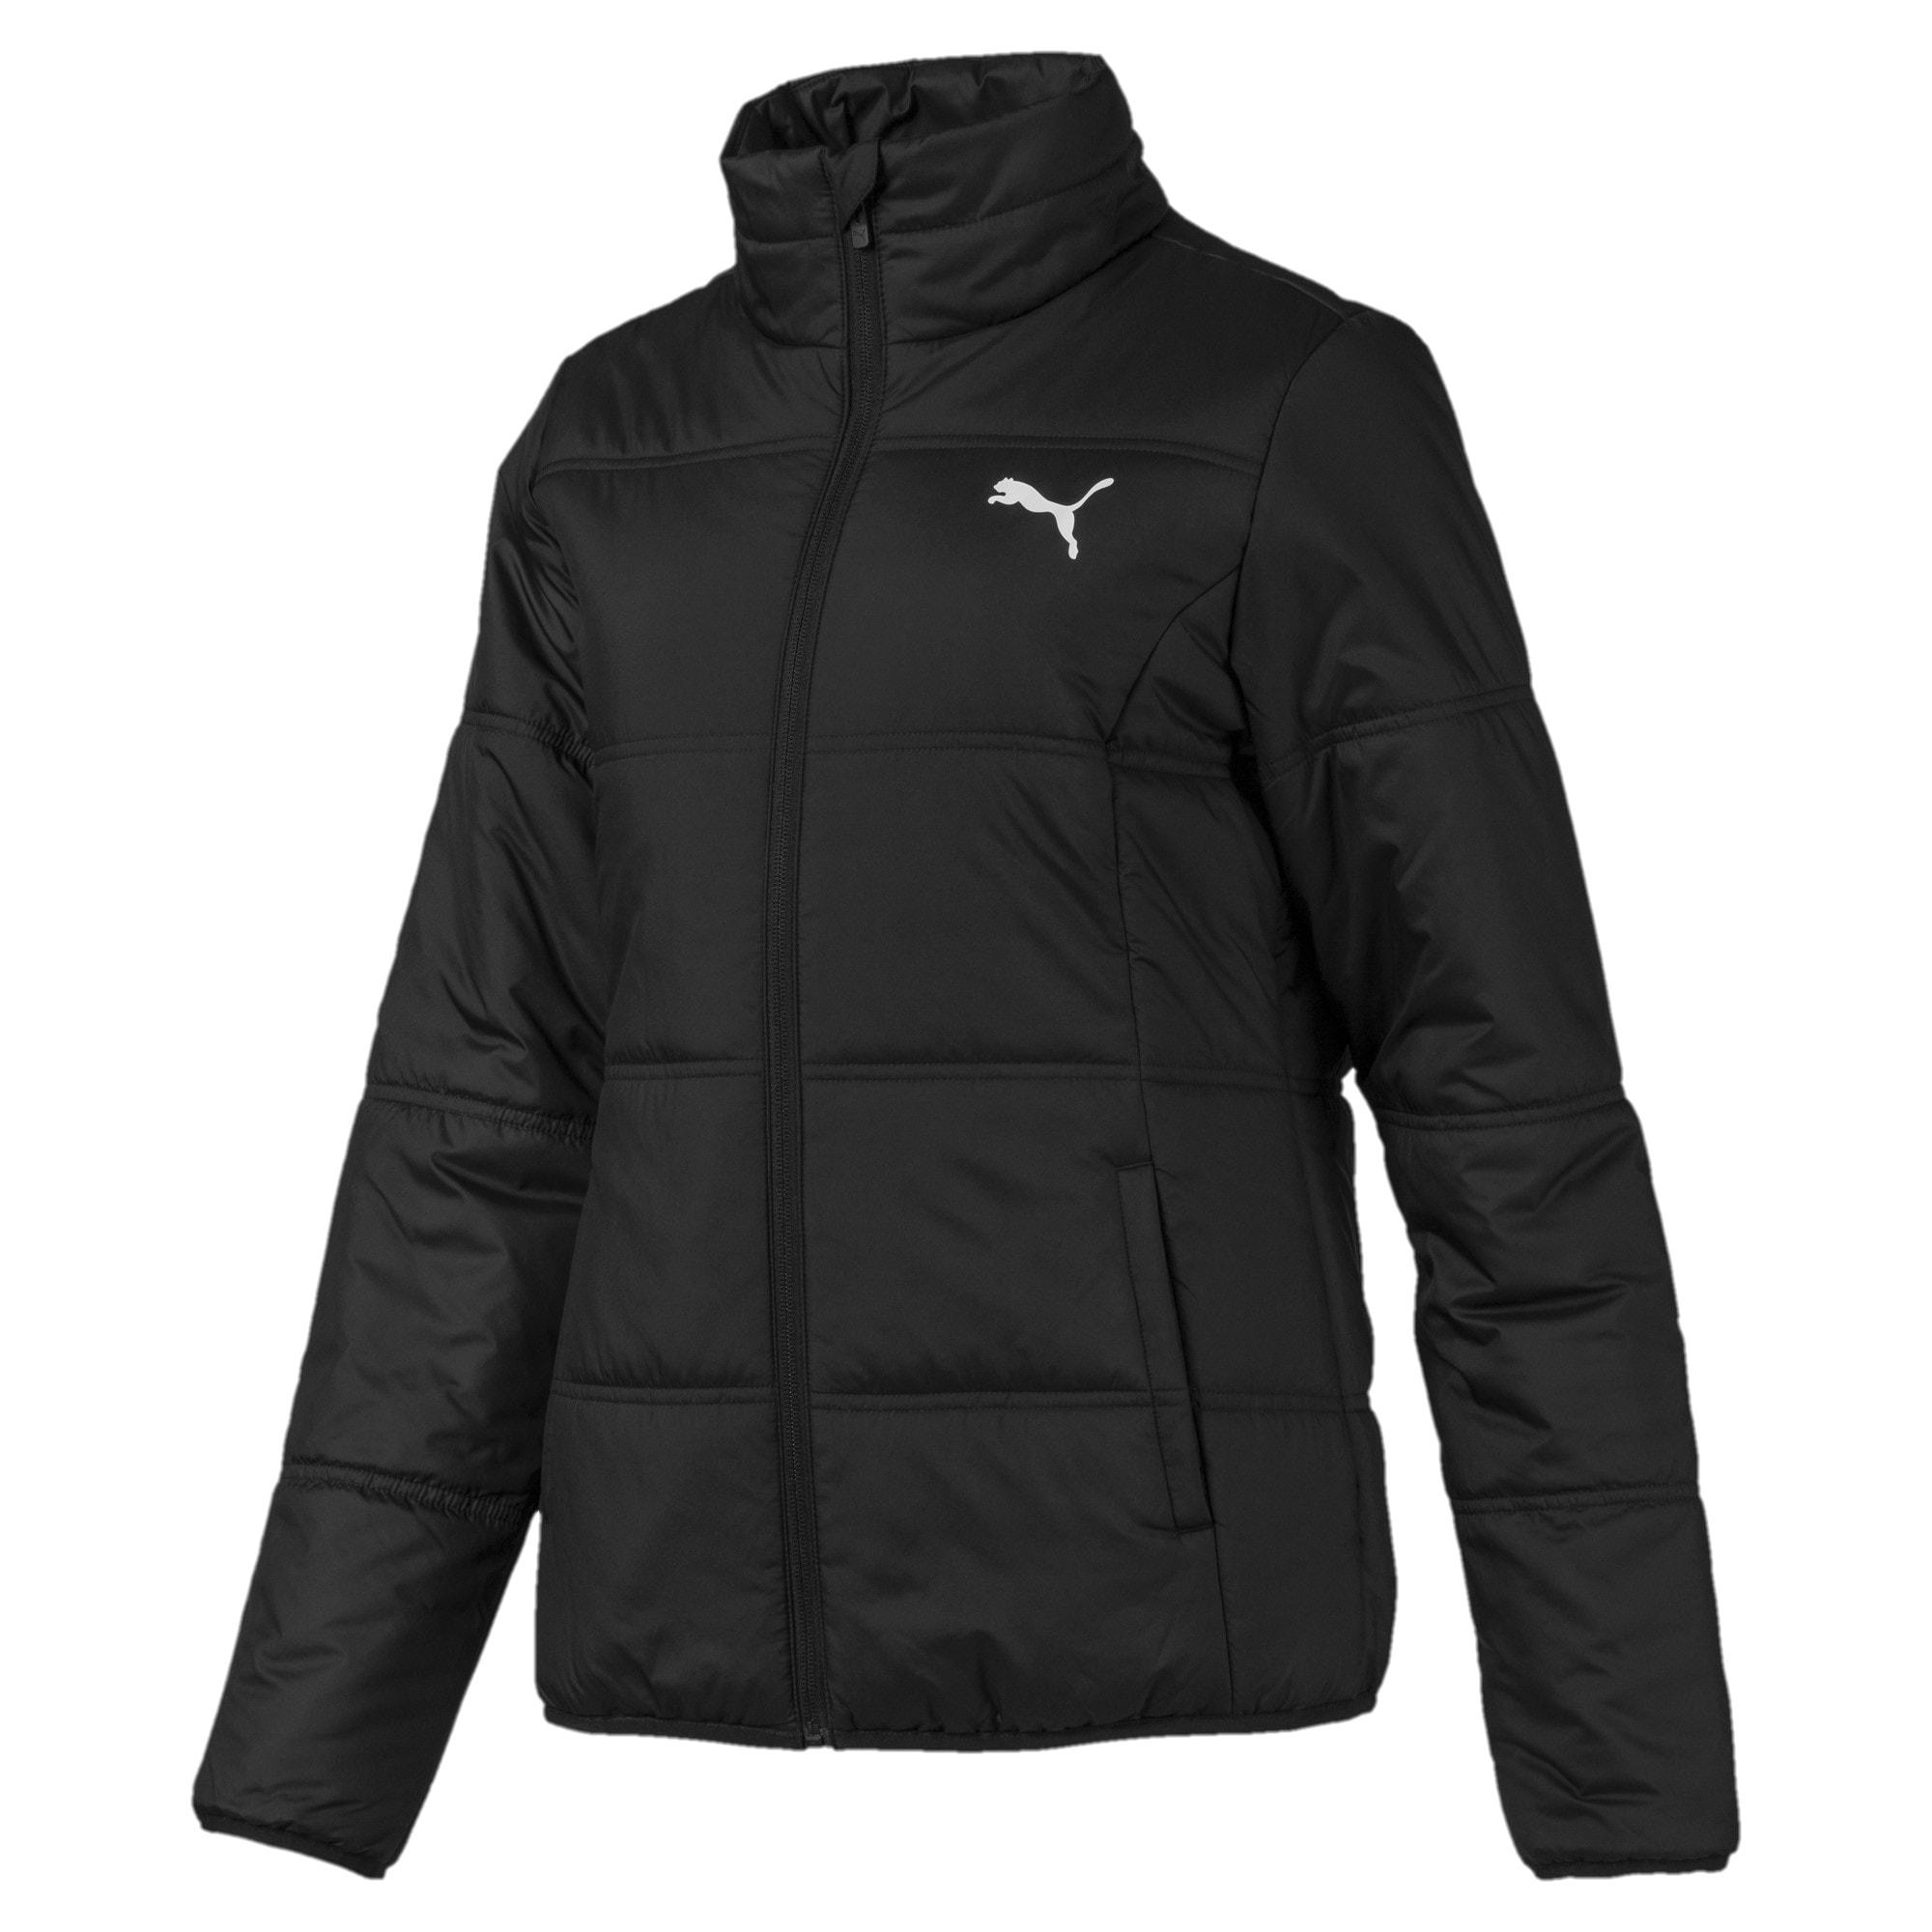 Thumbnail 4 of Essentials Padded Women's Jacket, Puma Black, medium